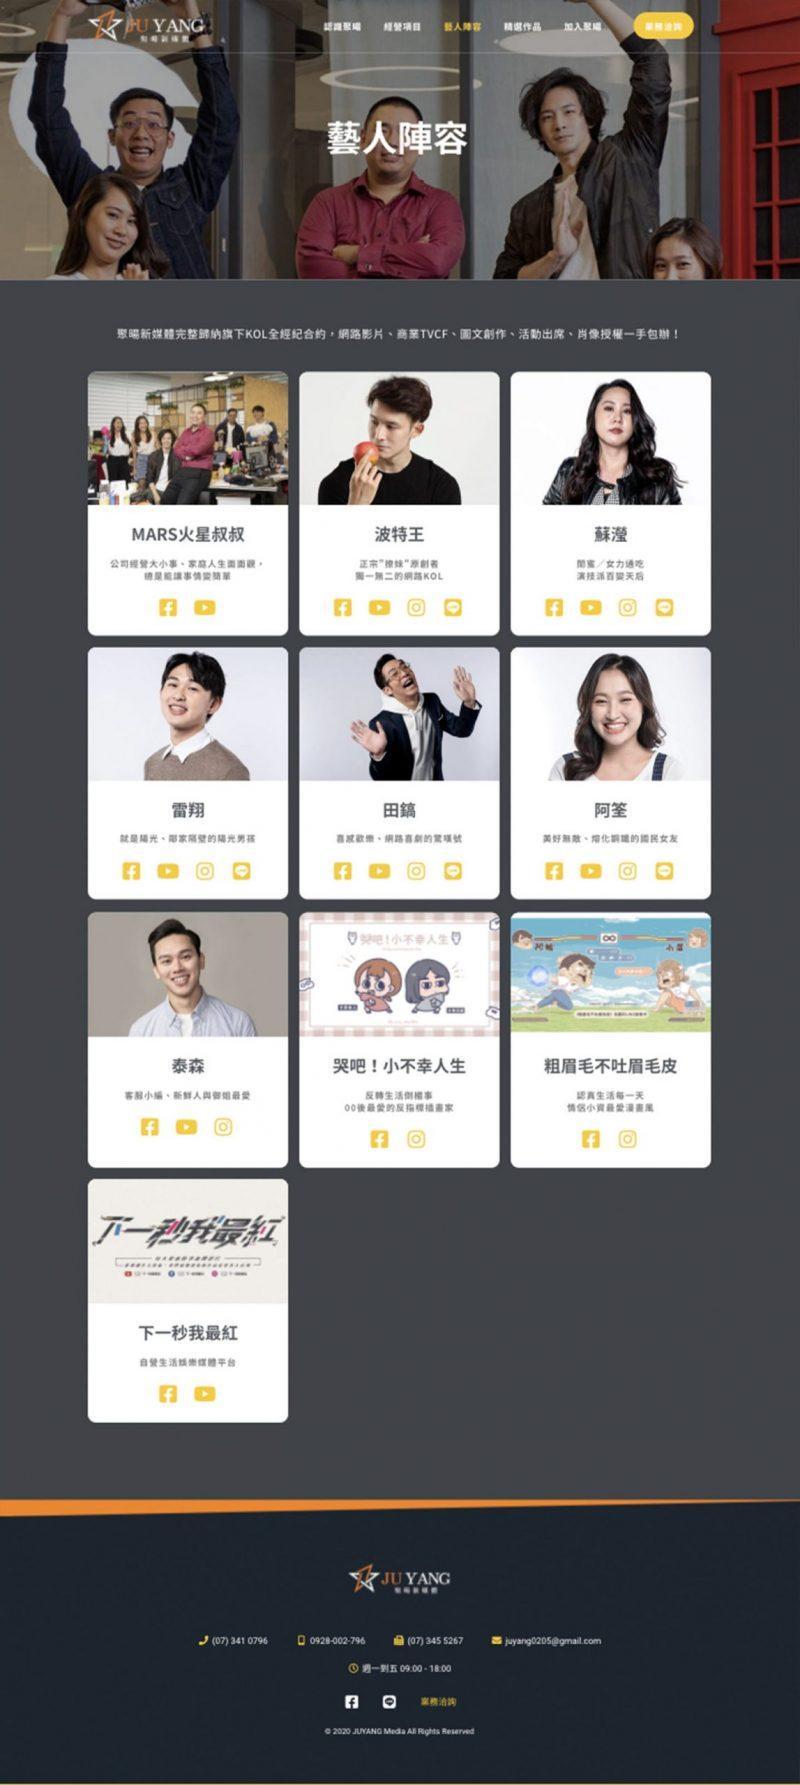 juyang_media_showcase2